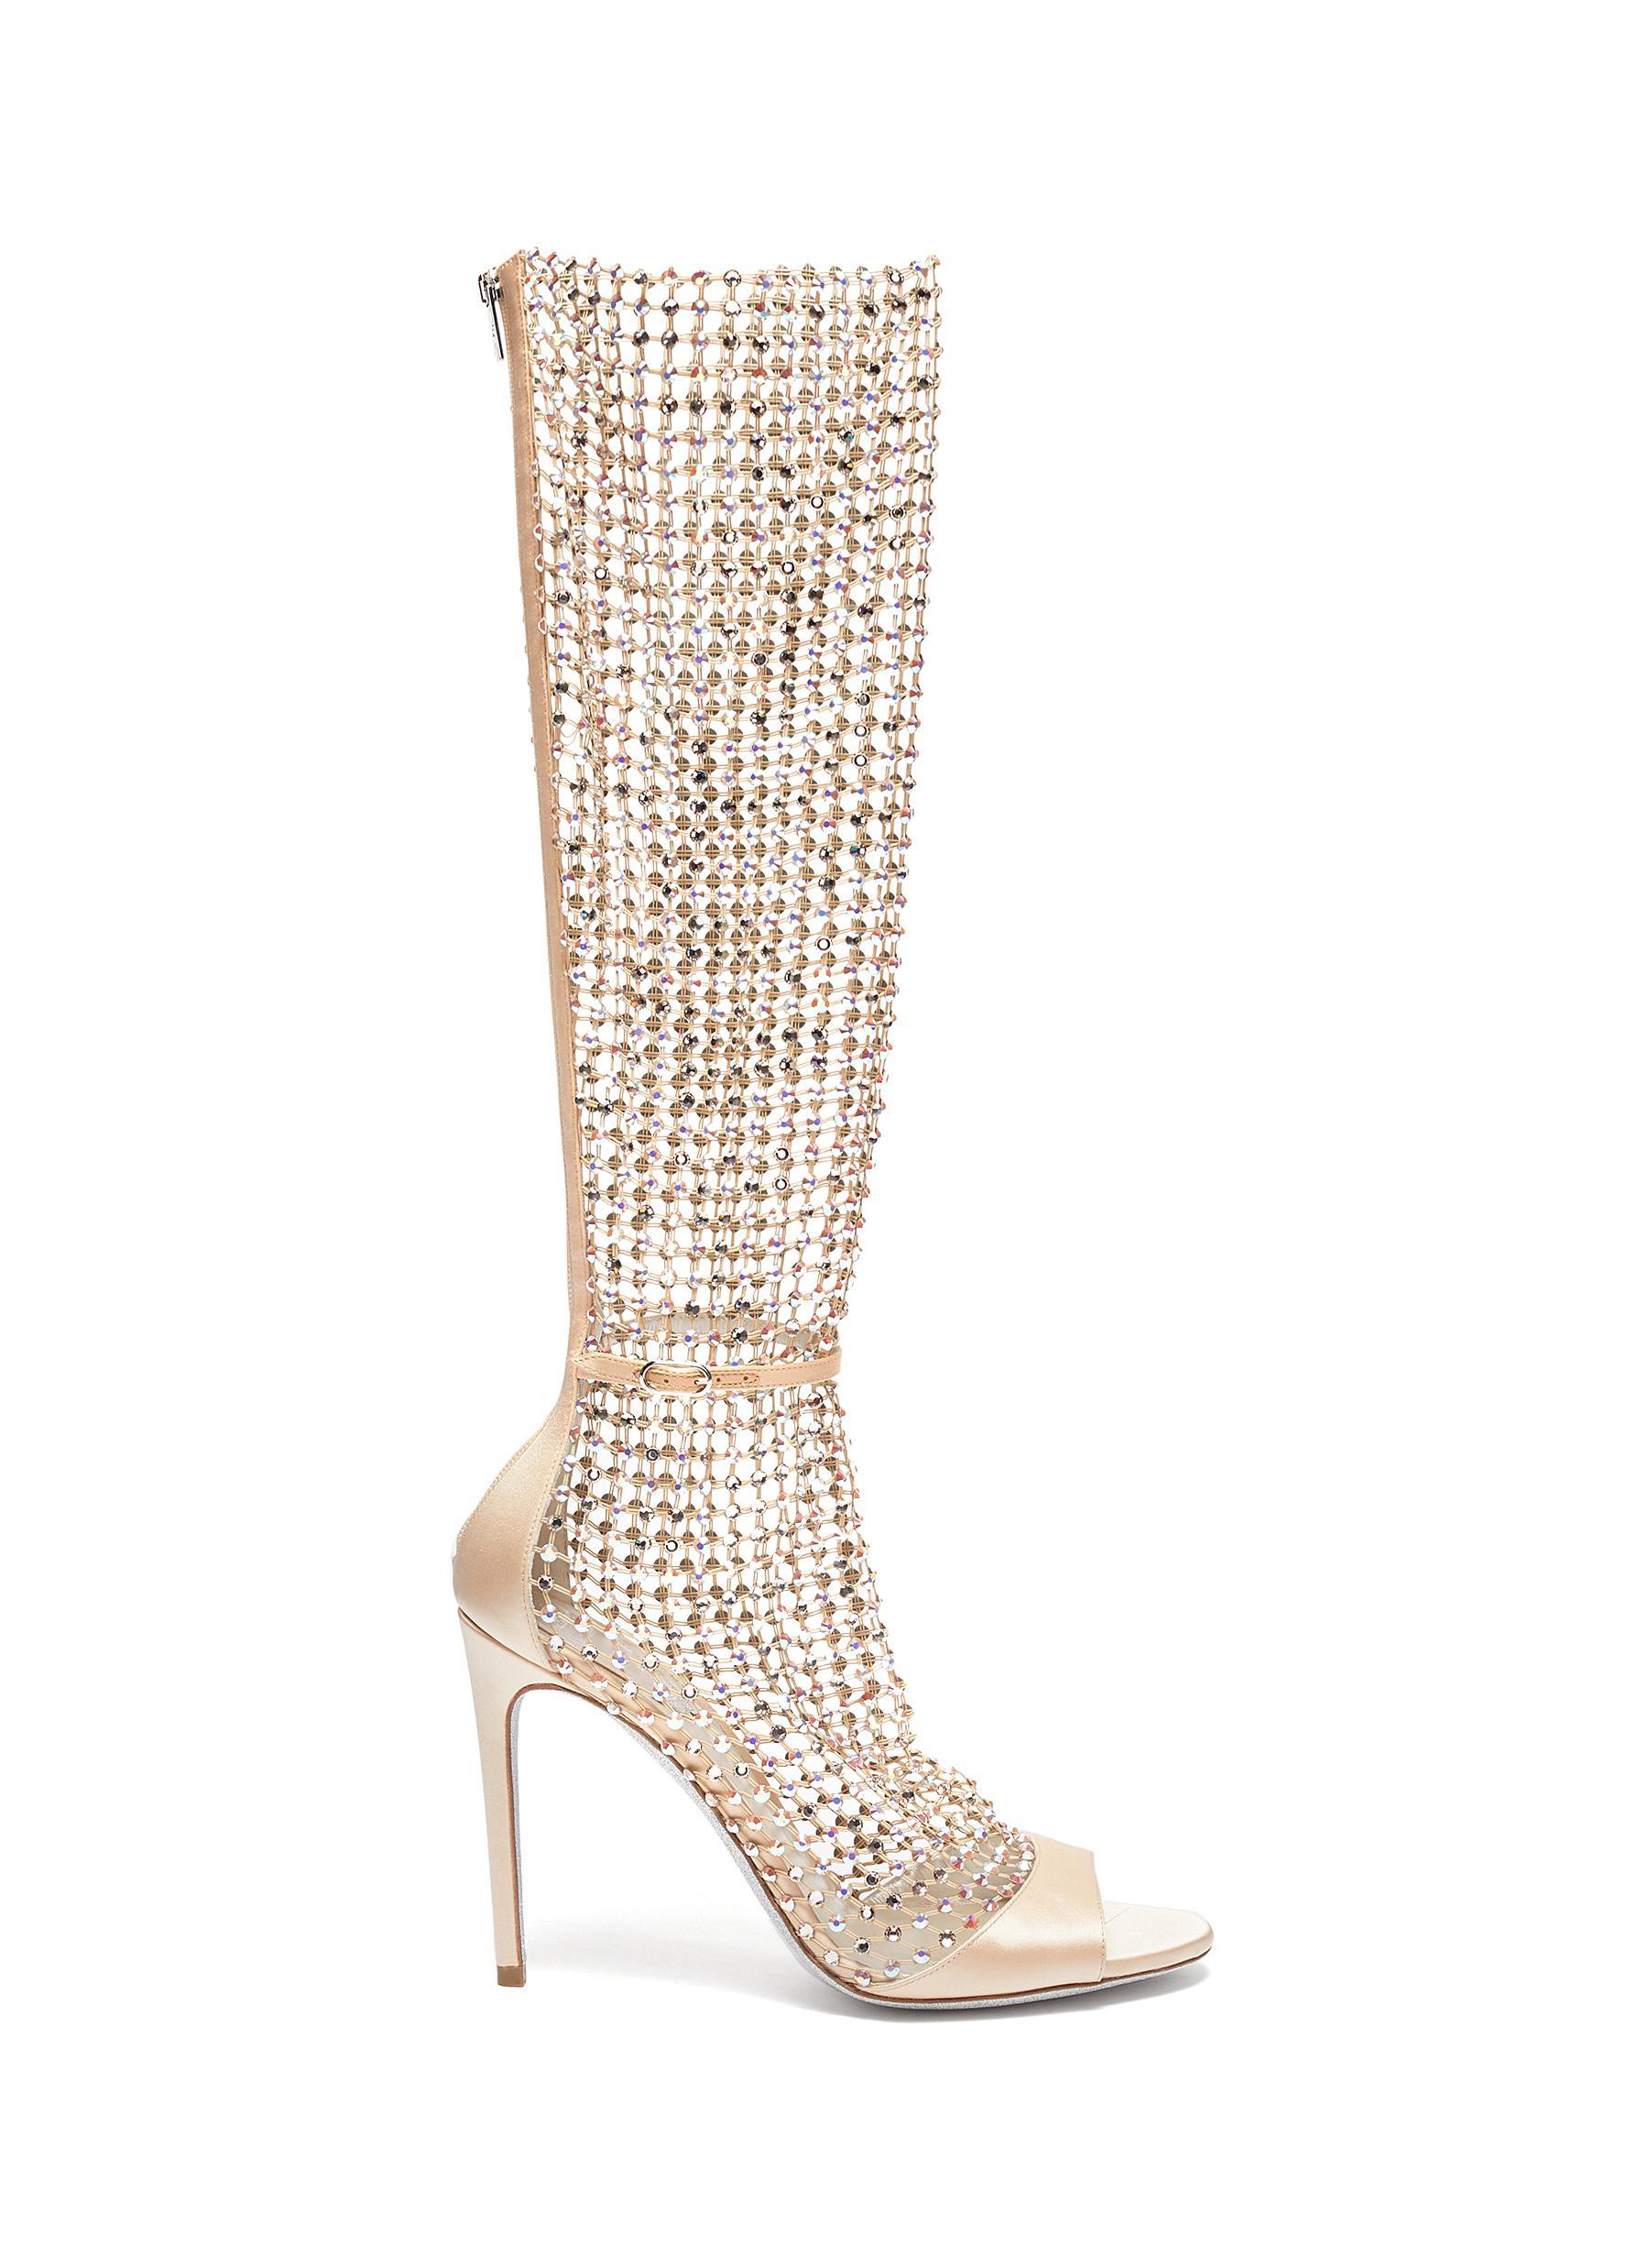 René Caovilla High Heels Galaxia strass cage satin sandals